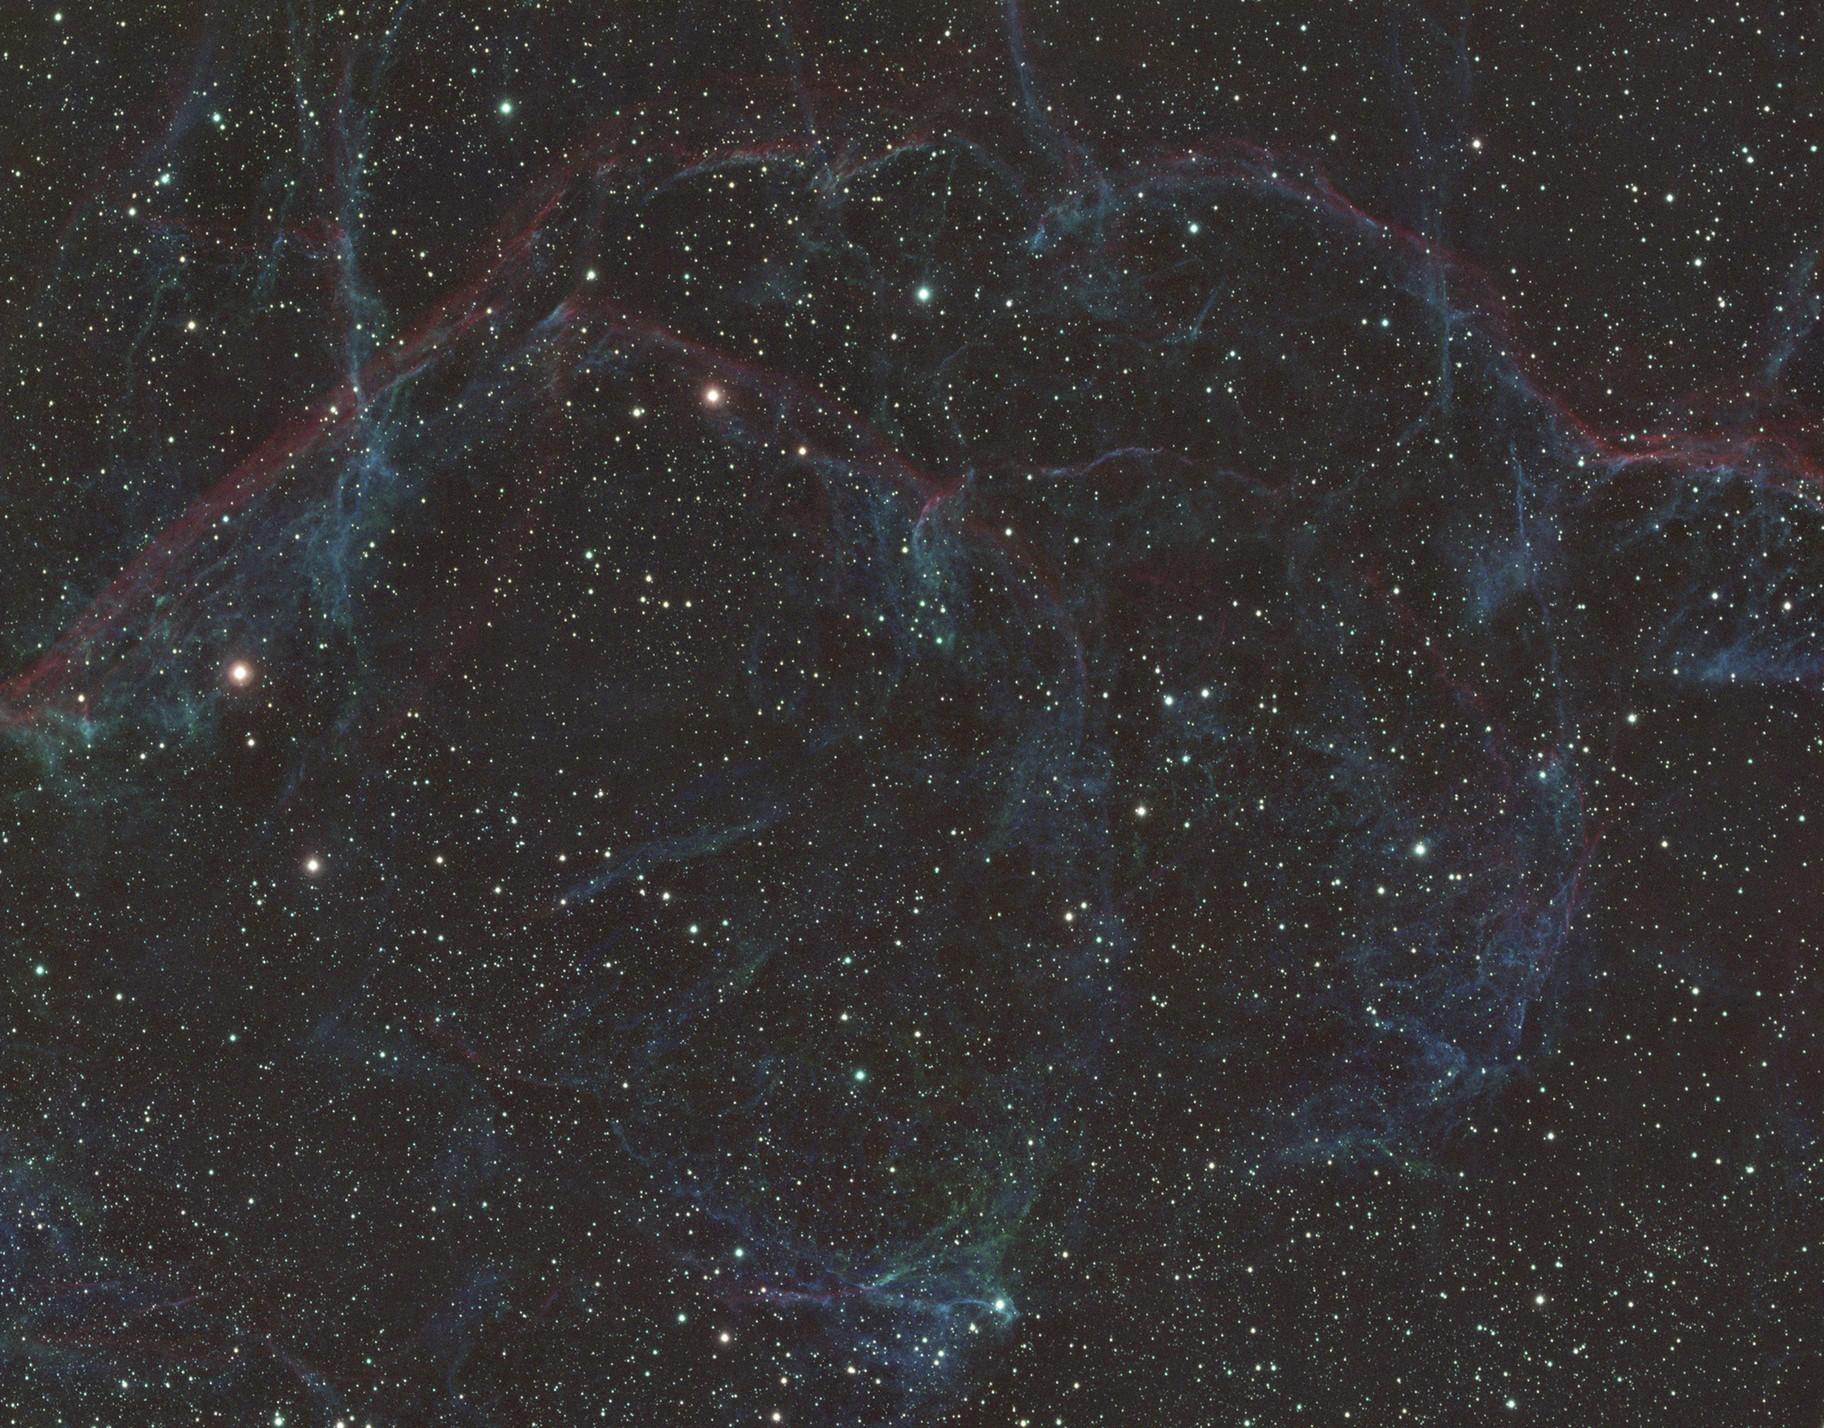 Vela Super Nova Remnant Mosaic in SIIHAOIII